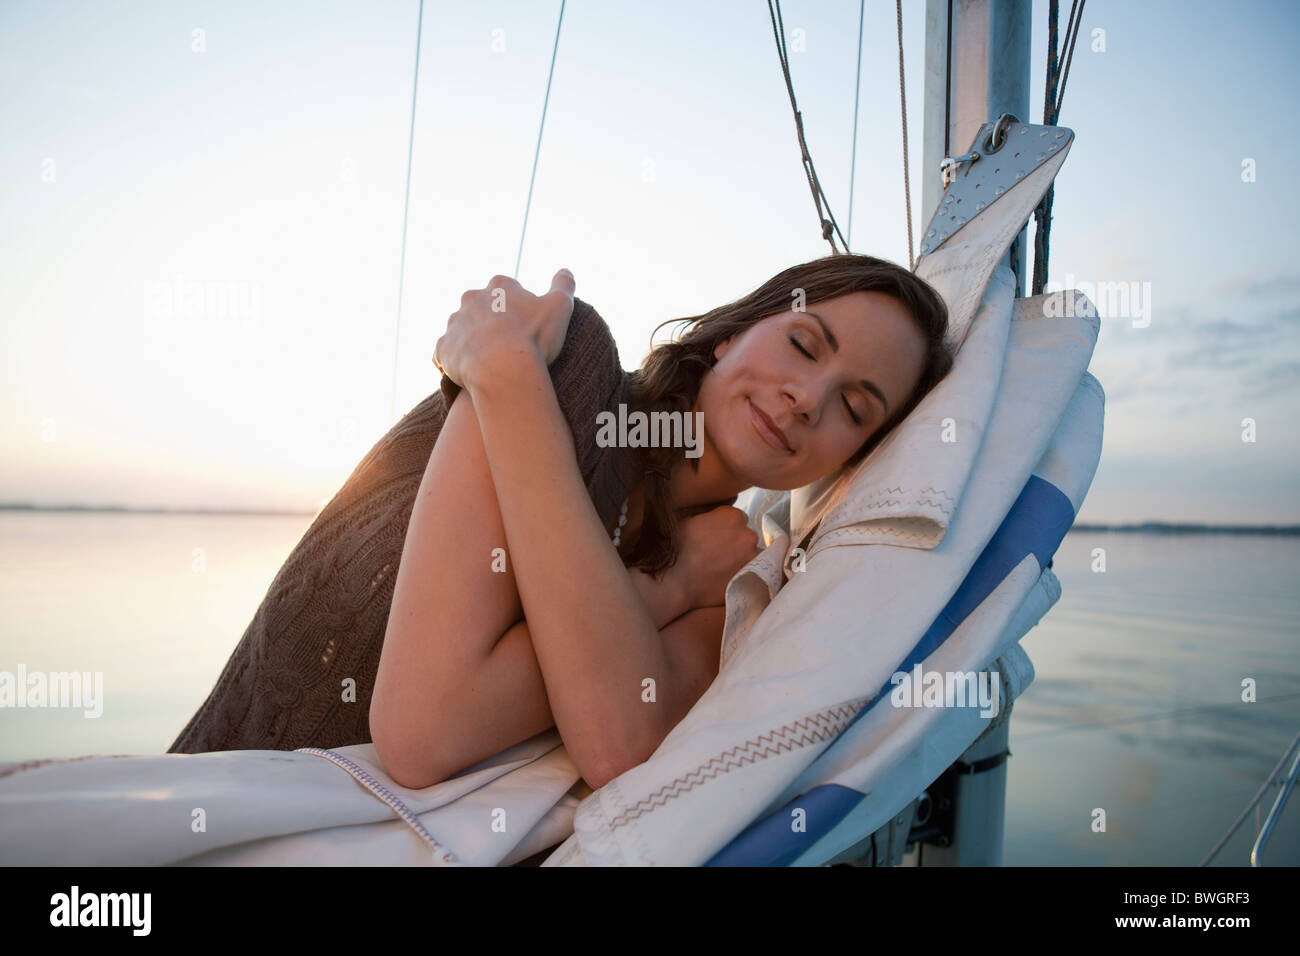 Girl standing on sail - Stock Image